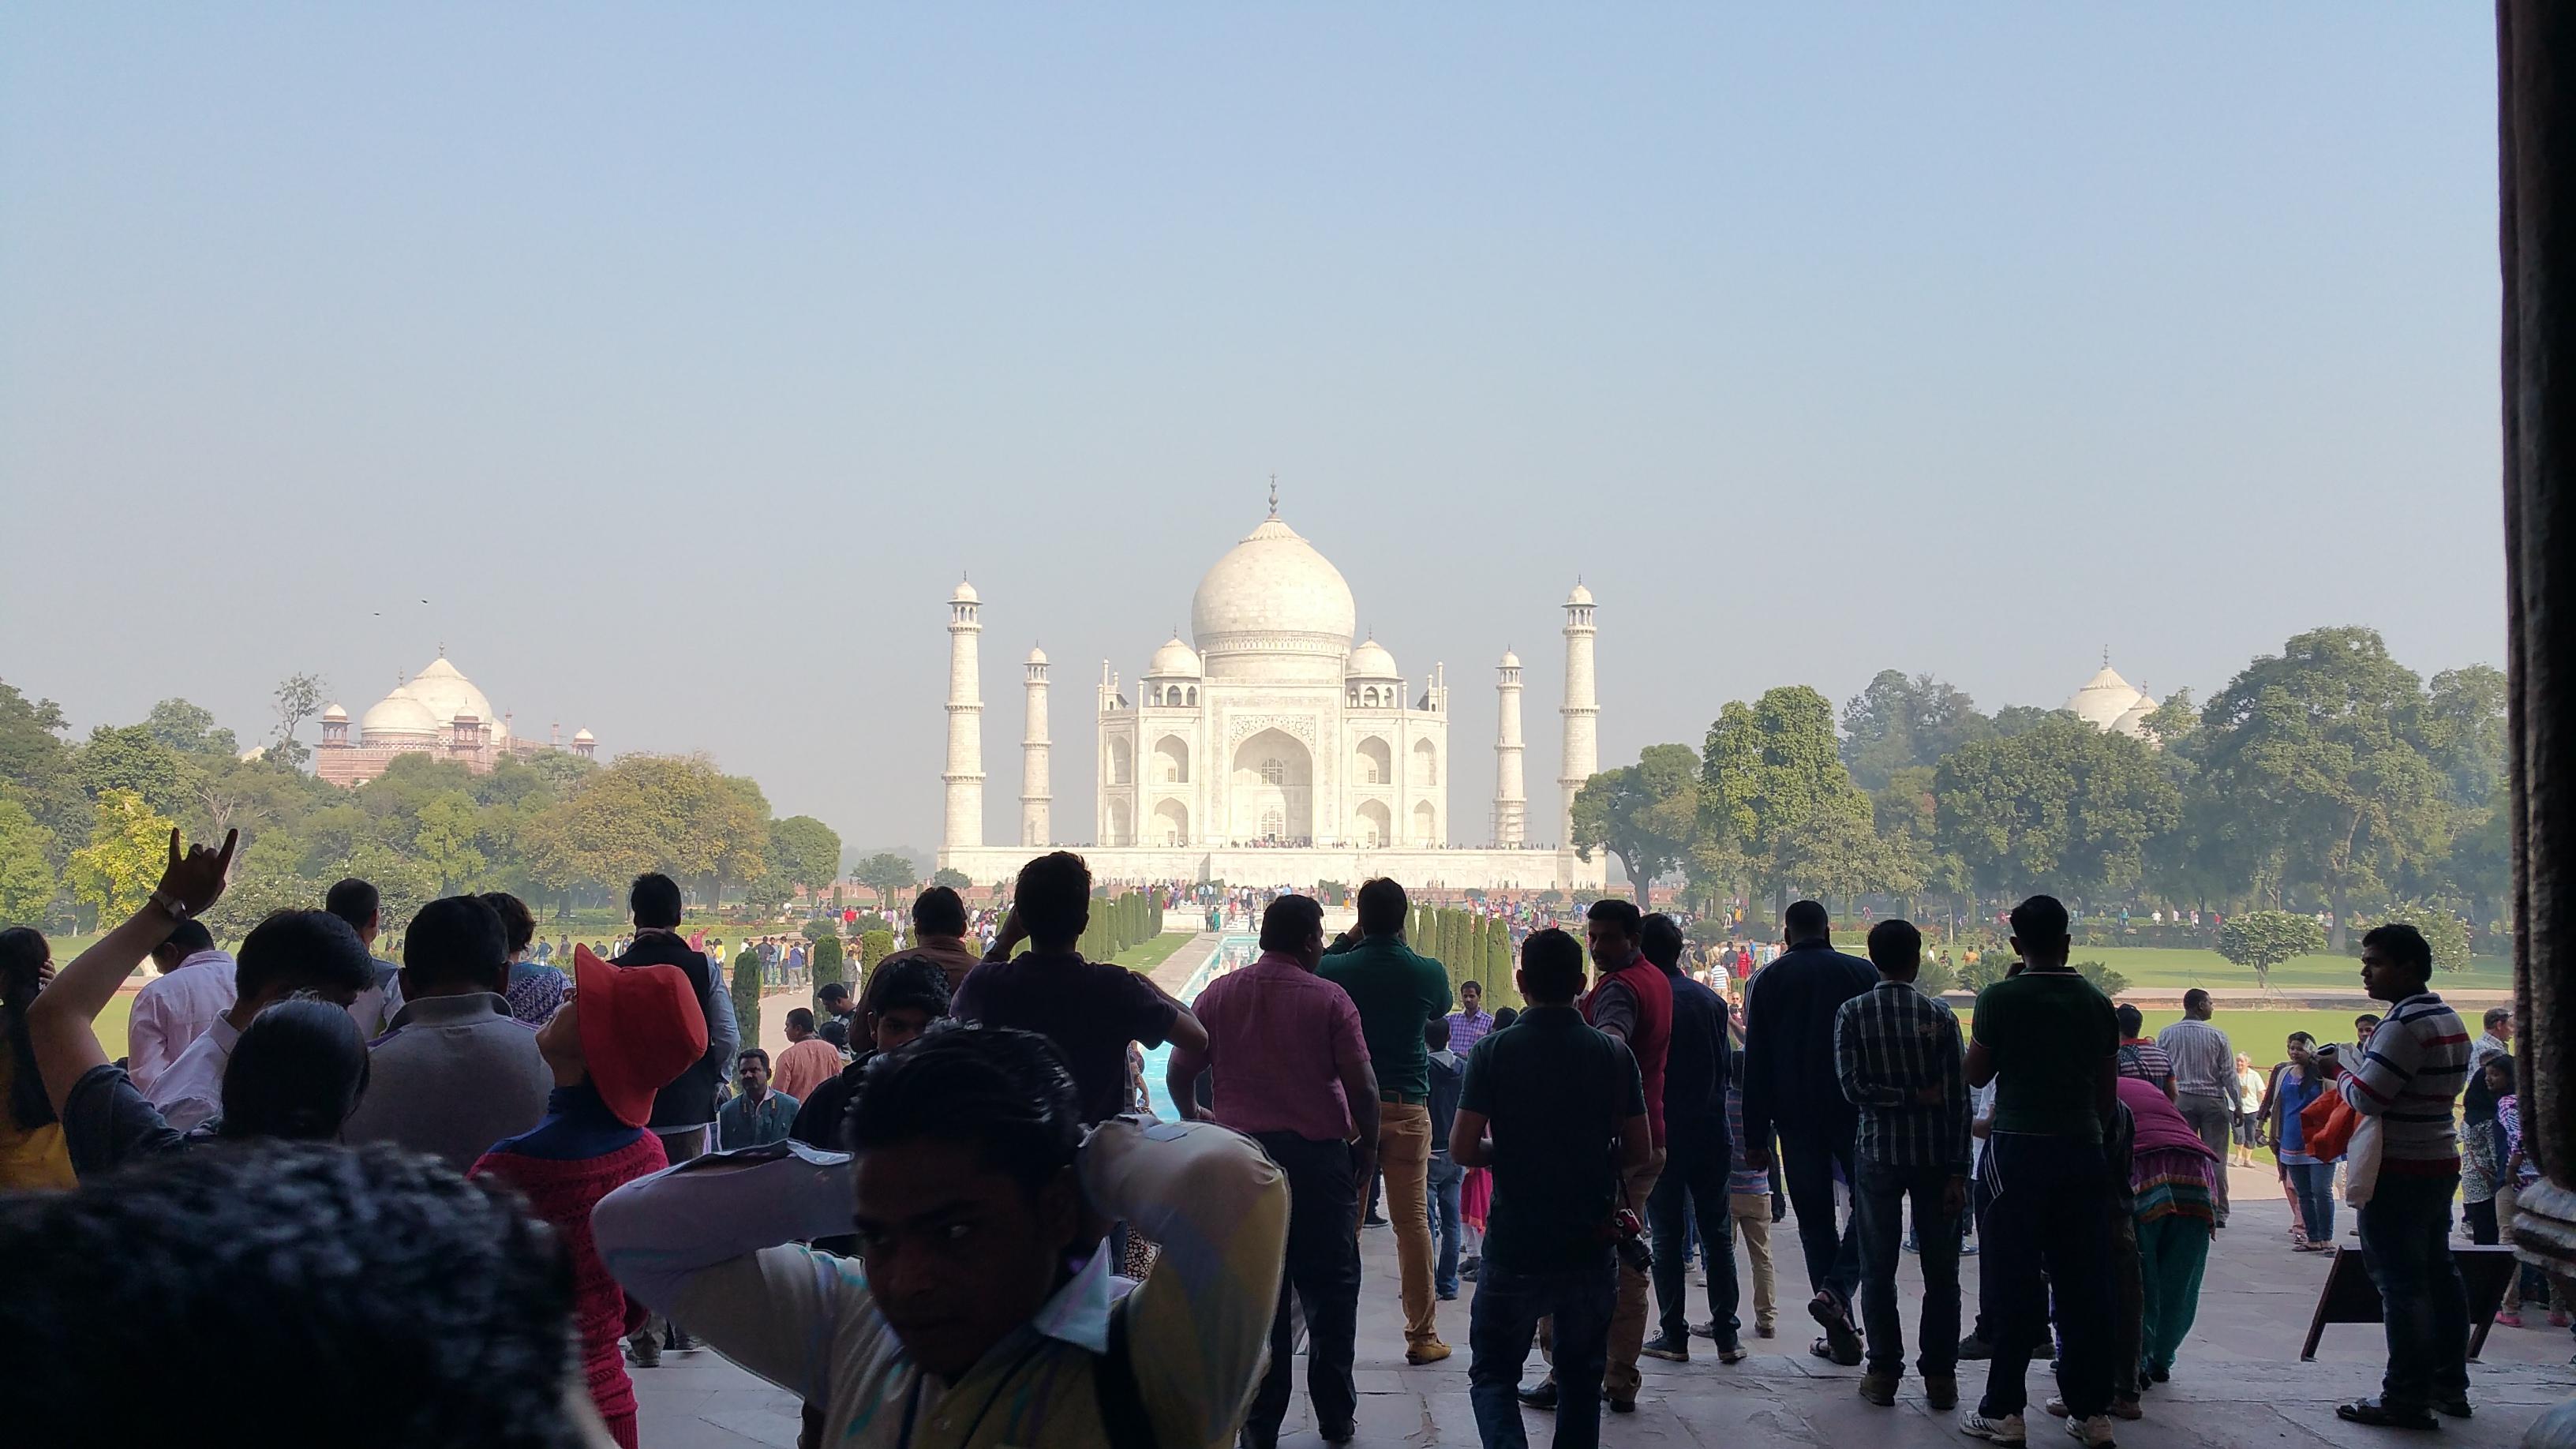 A view of the Taj Mahal, Agra, India.